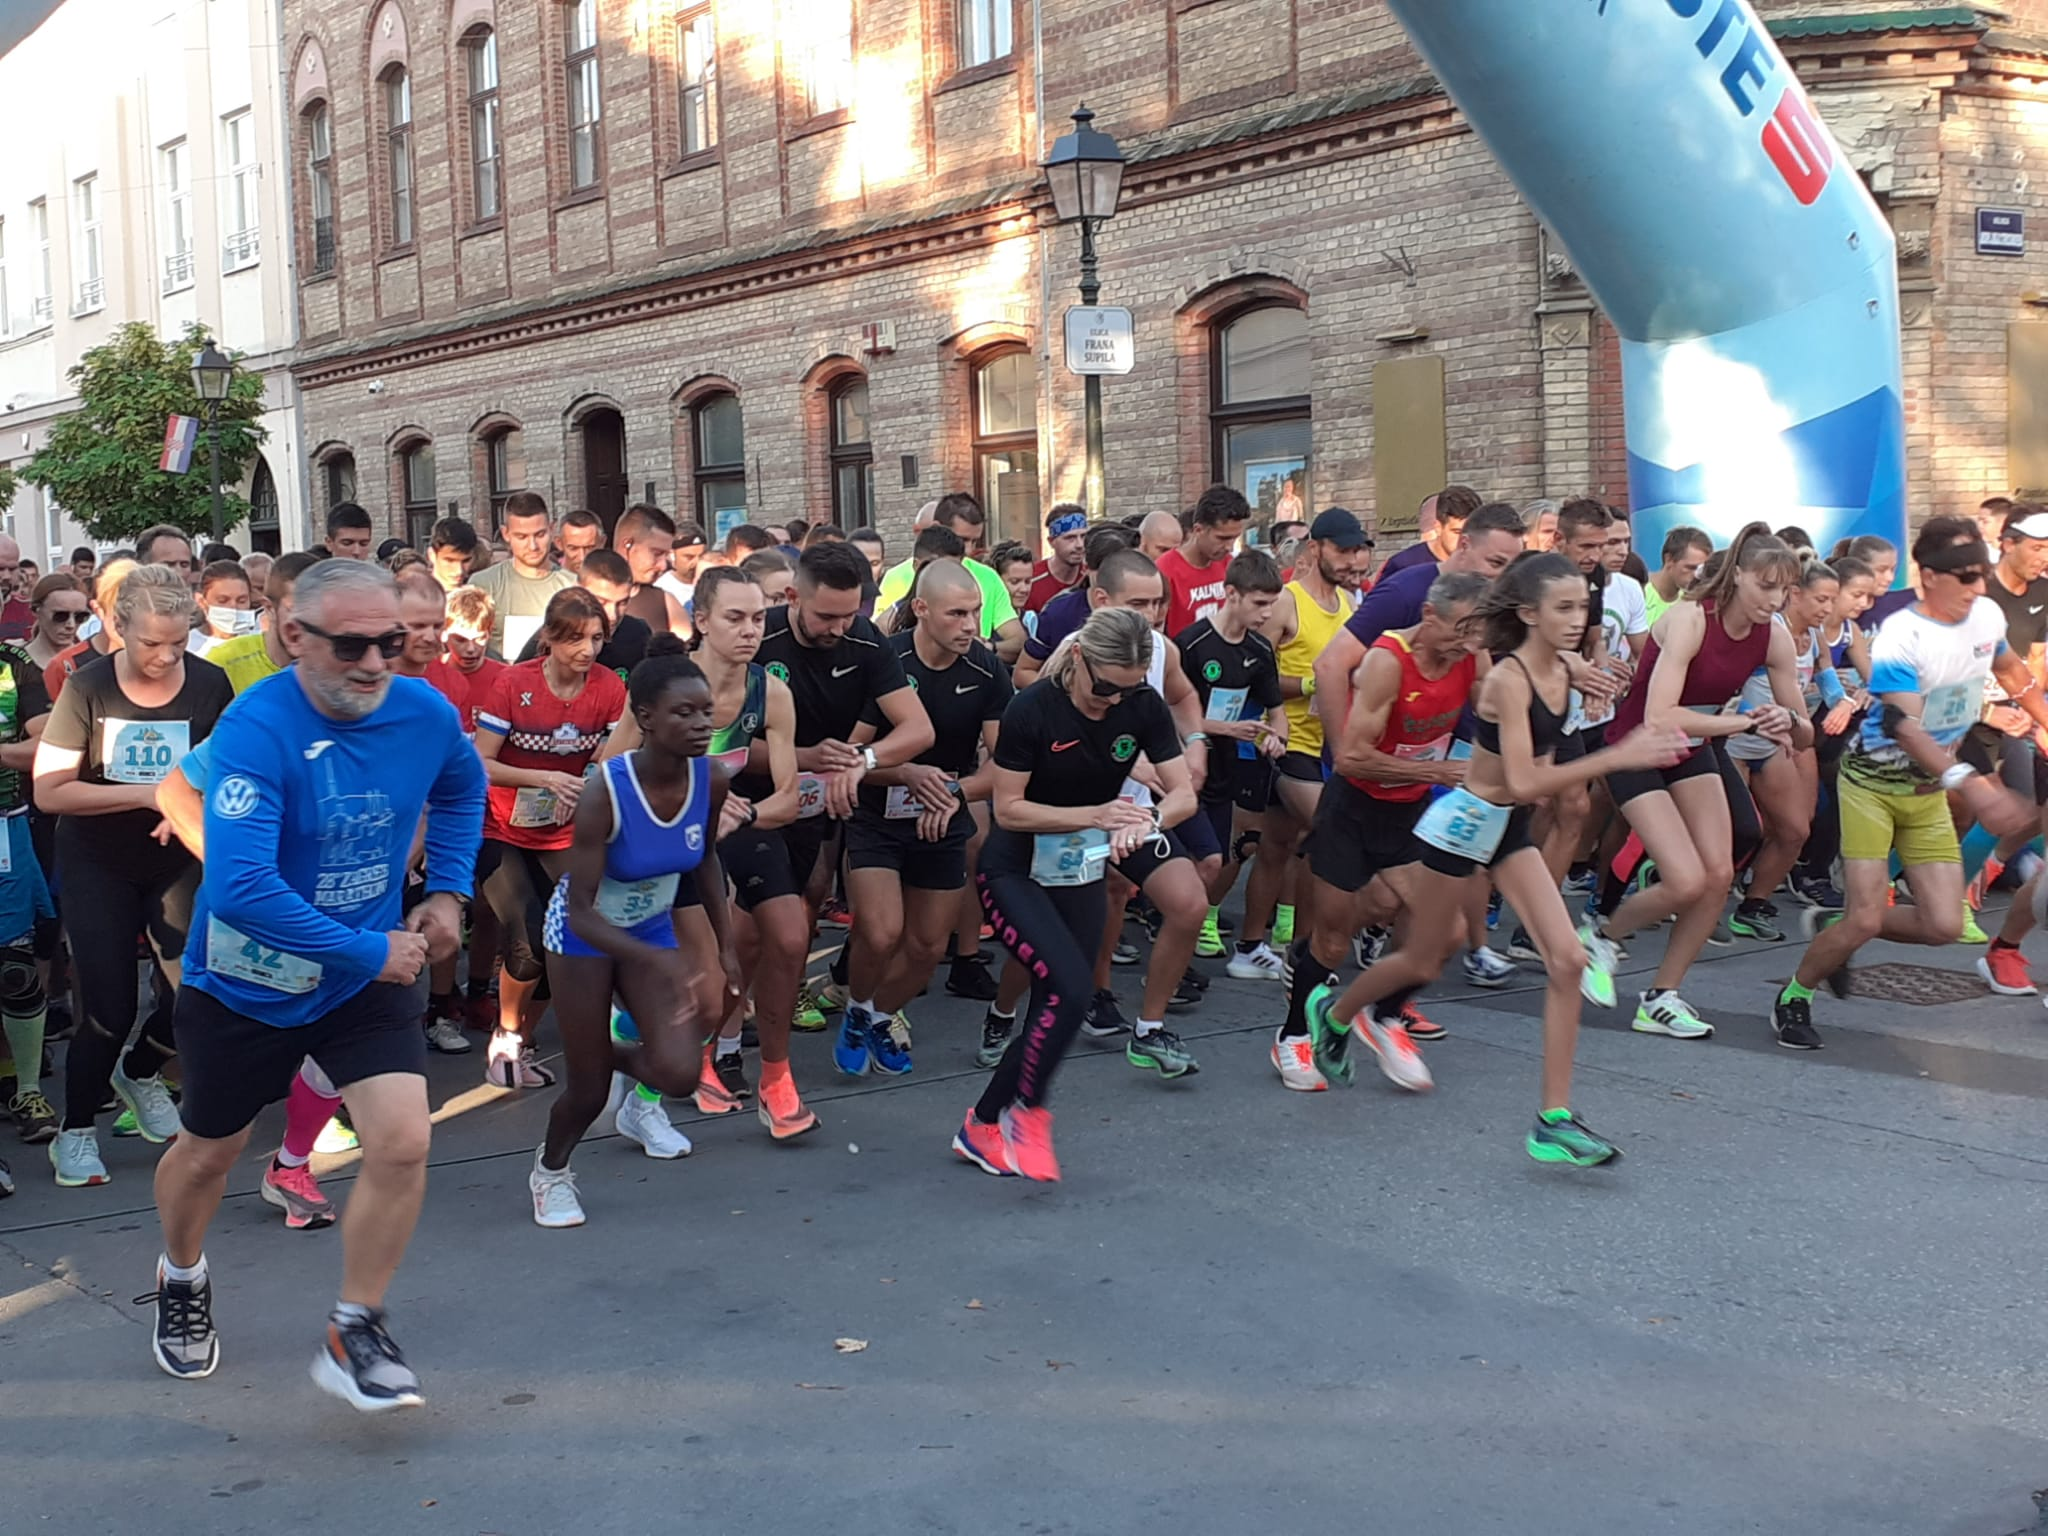 Bjelovarčani jedva dočekali popularnu utrku Fun Run